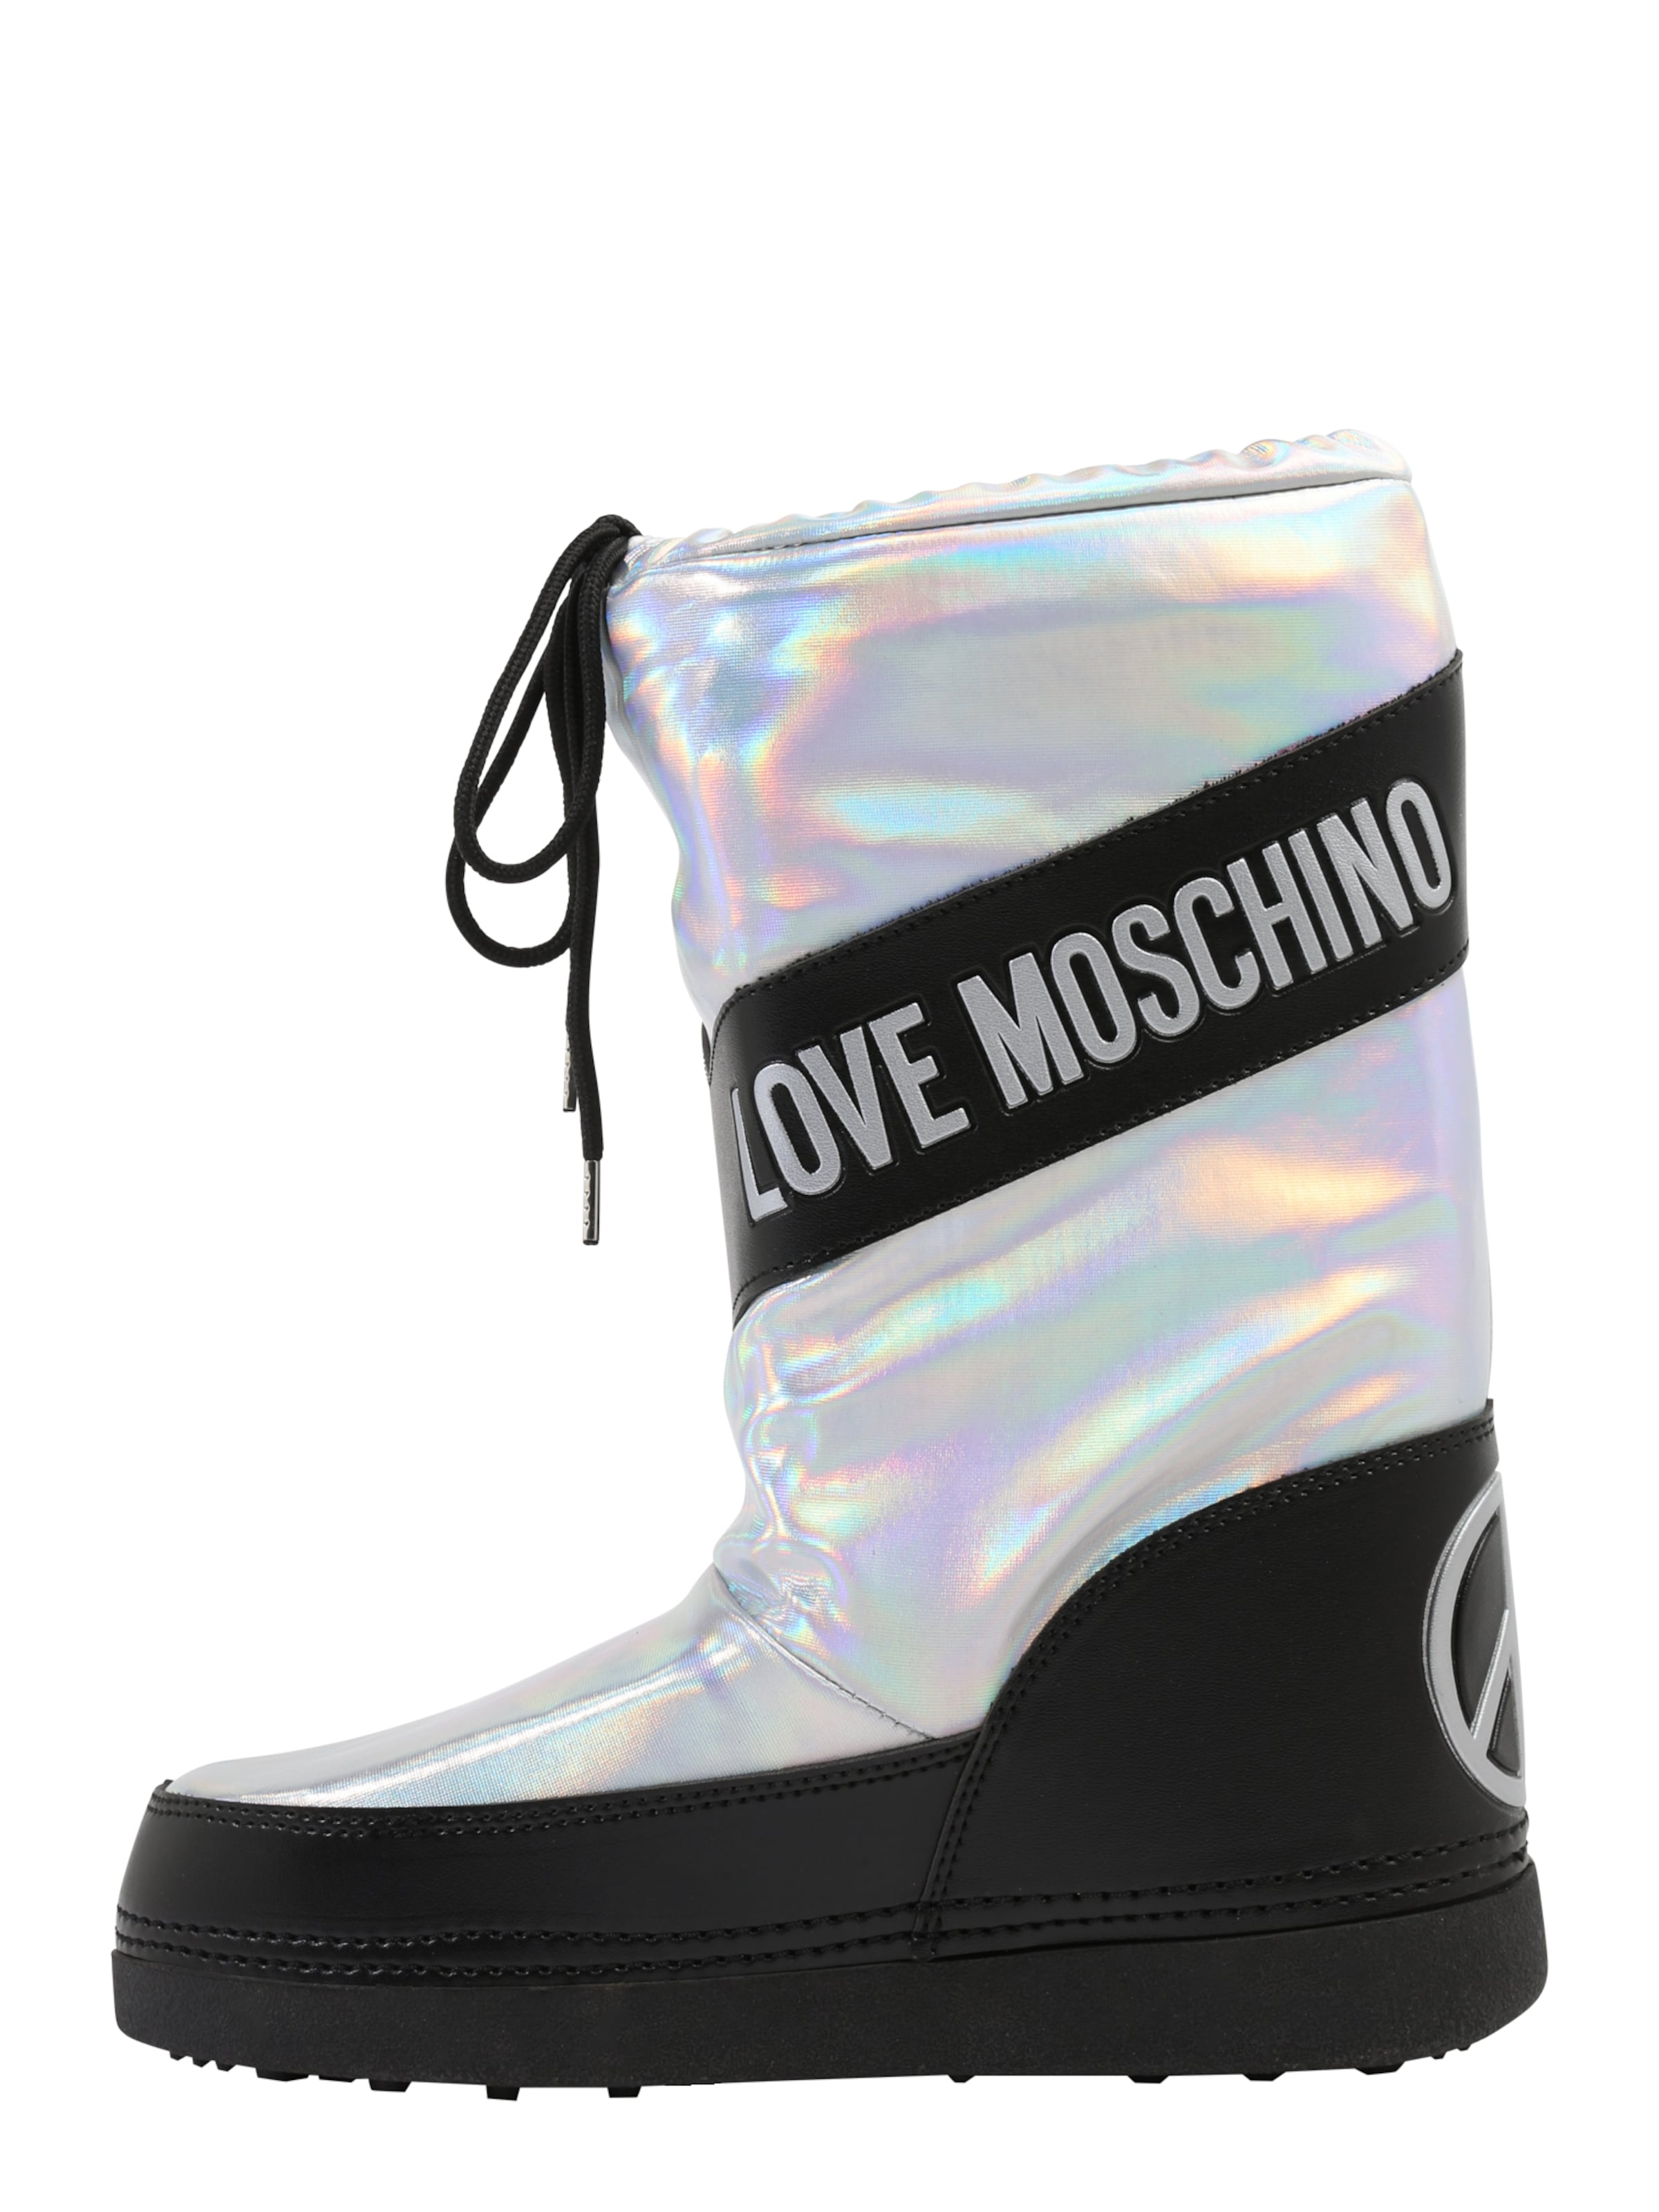 Love Après Moschino ski Boot' NoirArgent 'ski En f76vIYbgy